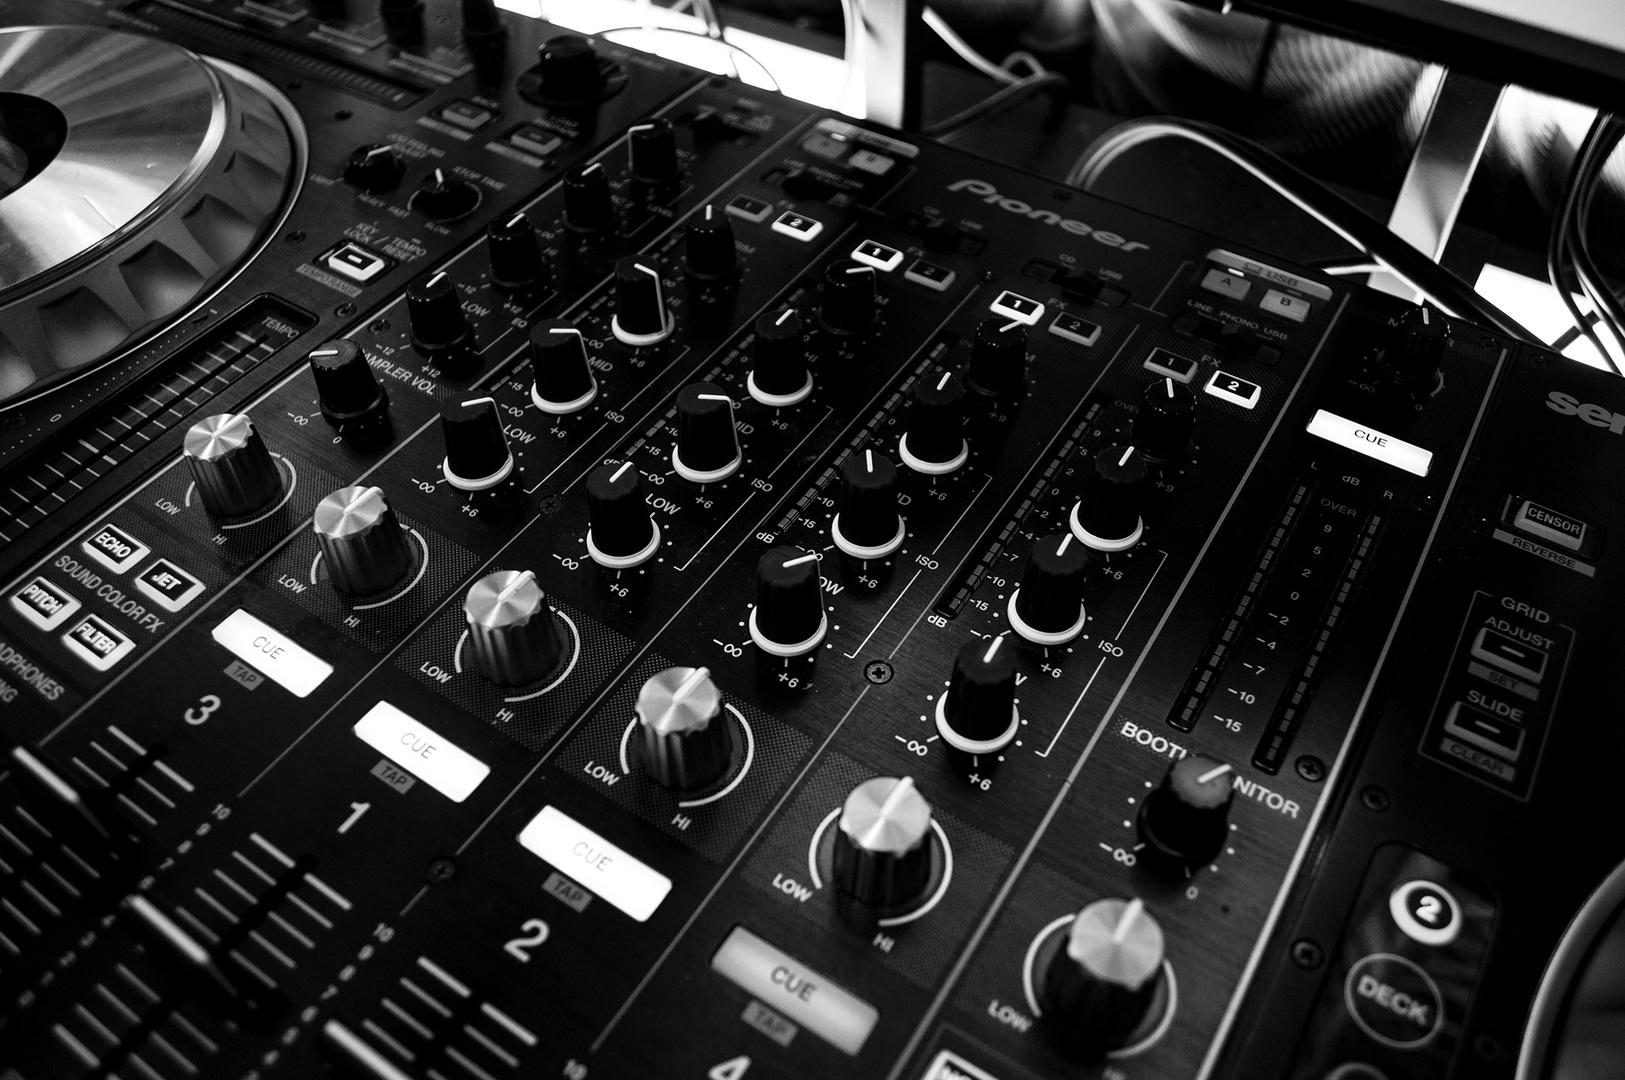 table-music-turntable-black-and-white-monochrome-dj-812188-pxhere.com